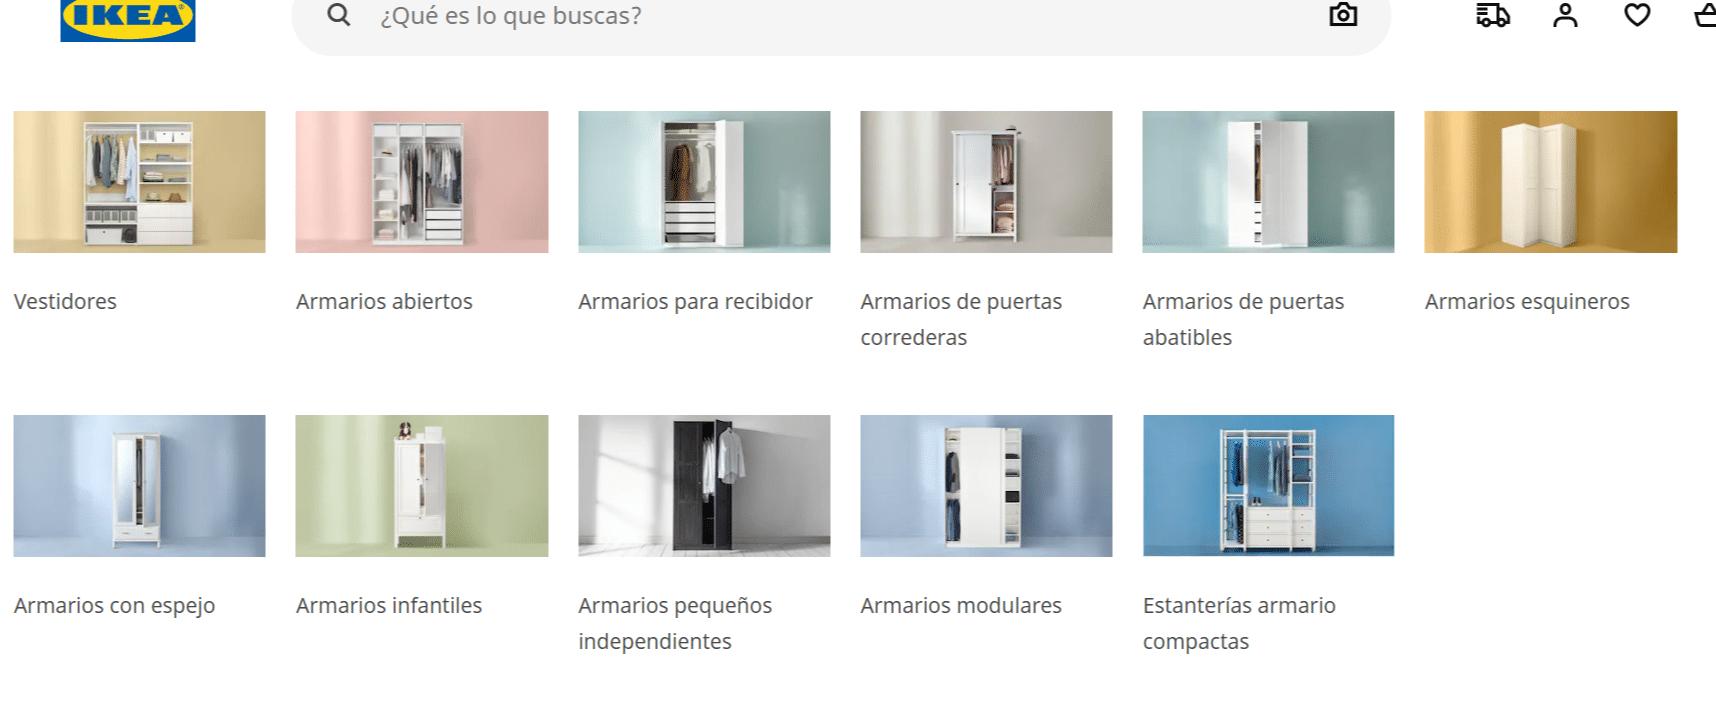 como posicionar en primera pagina IKEA marketing digital para pymes autonomos paulapmartin